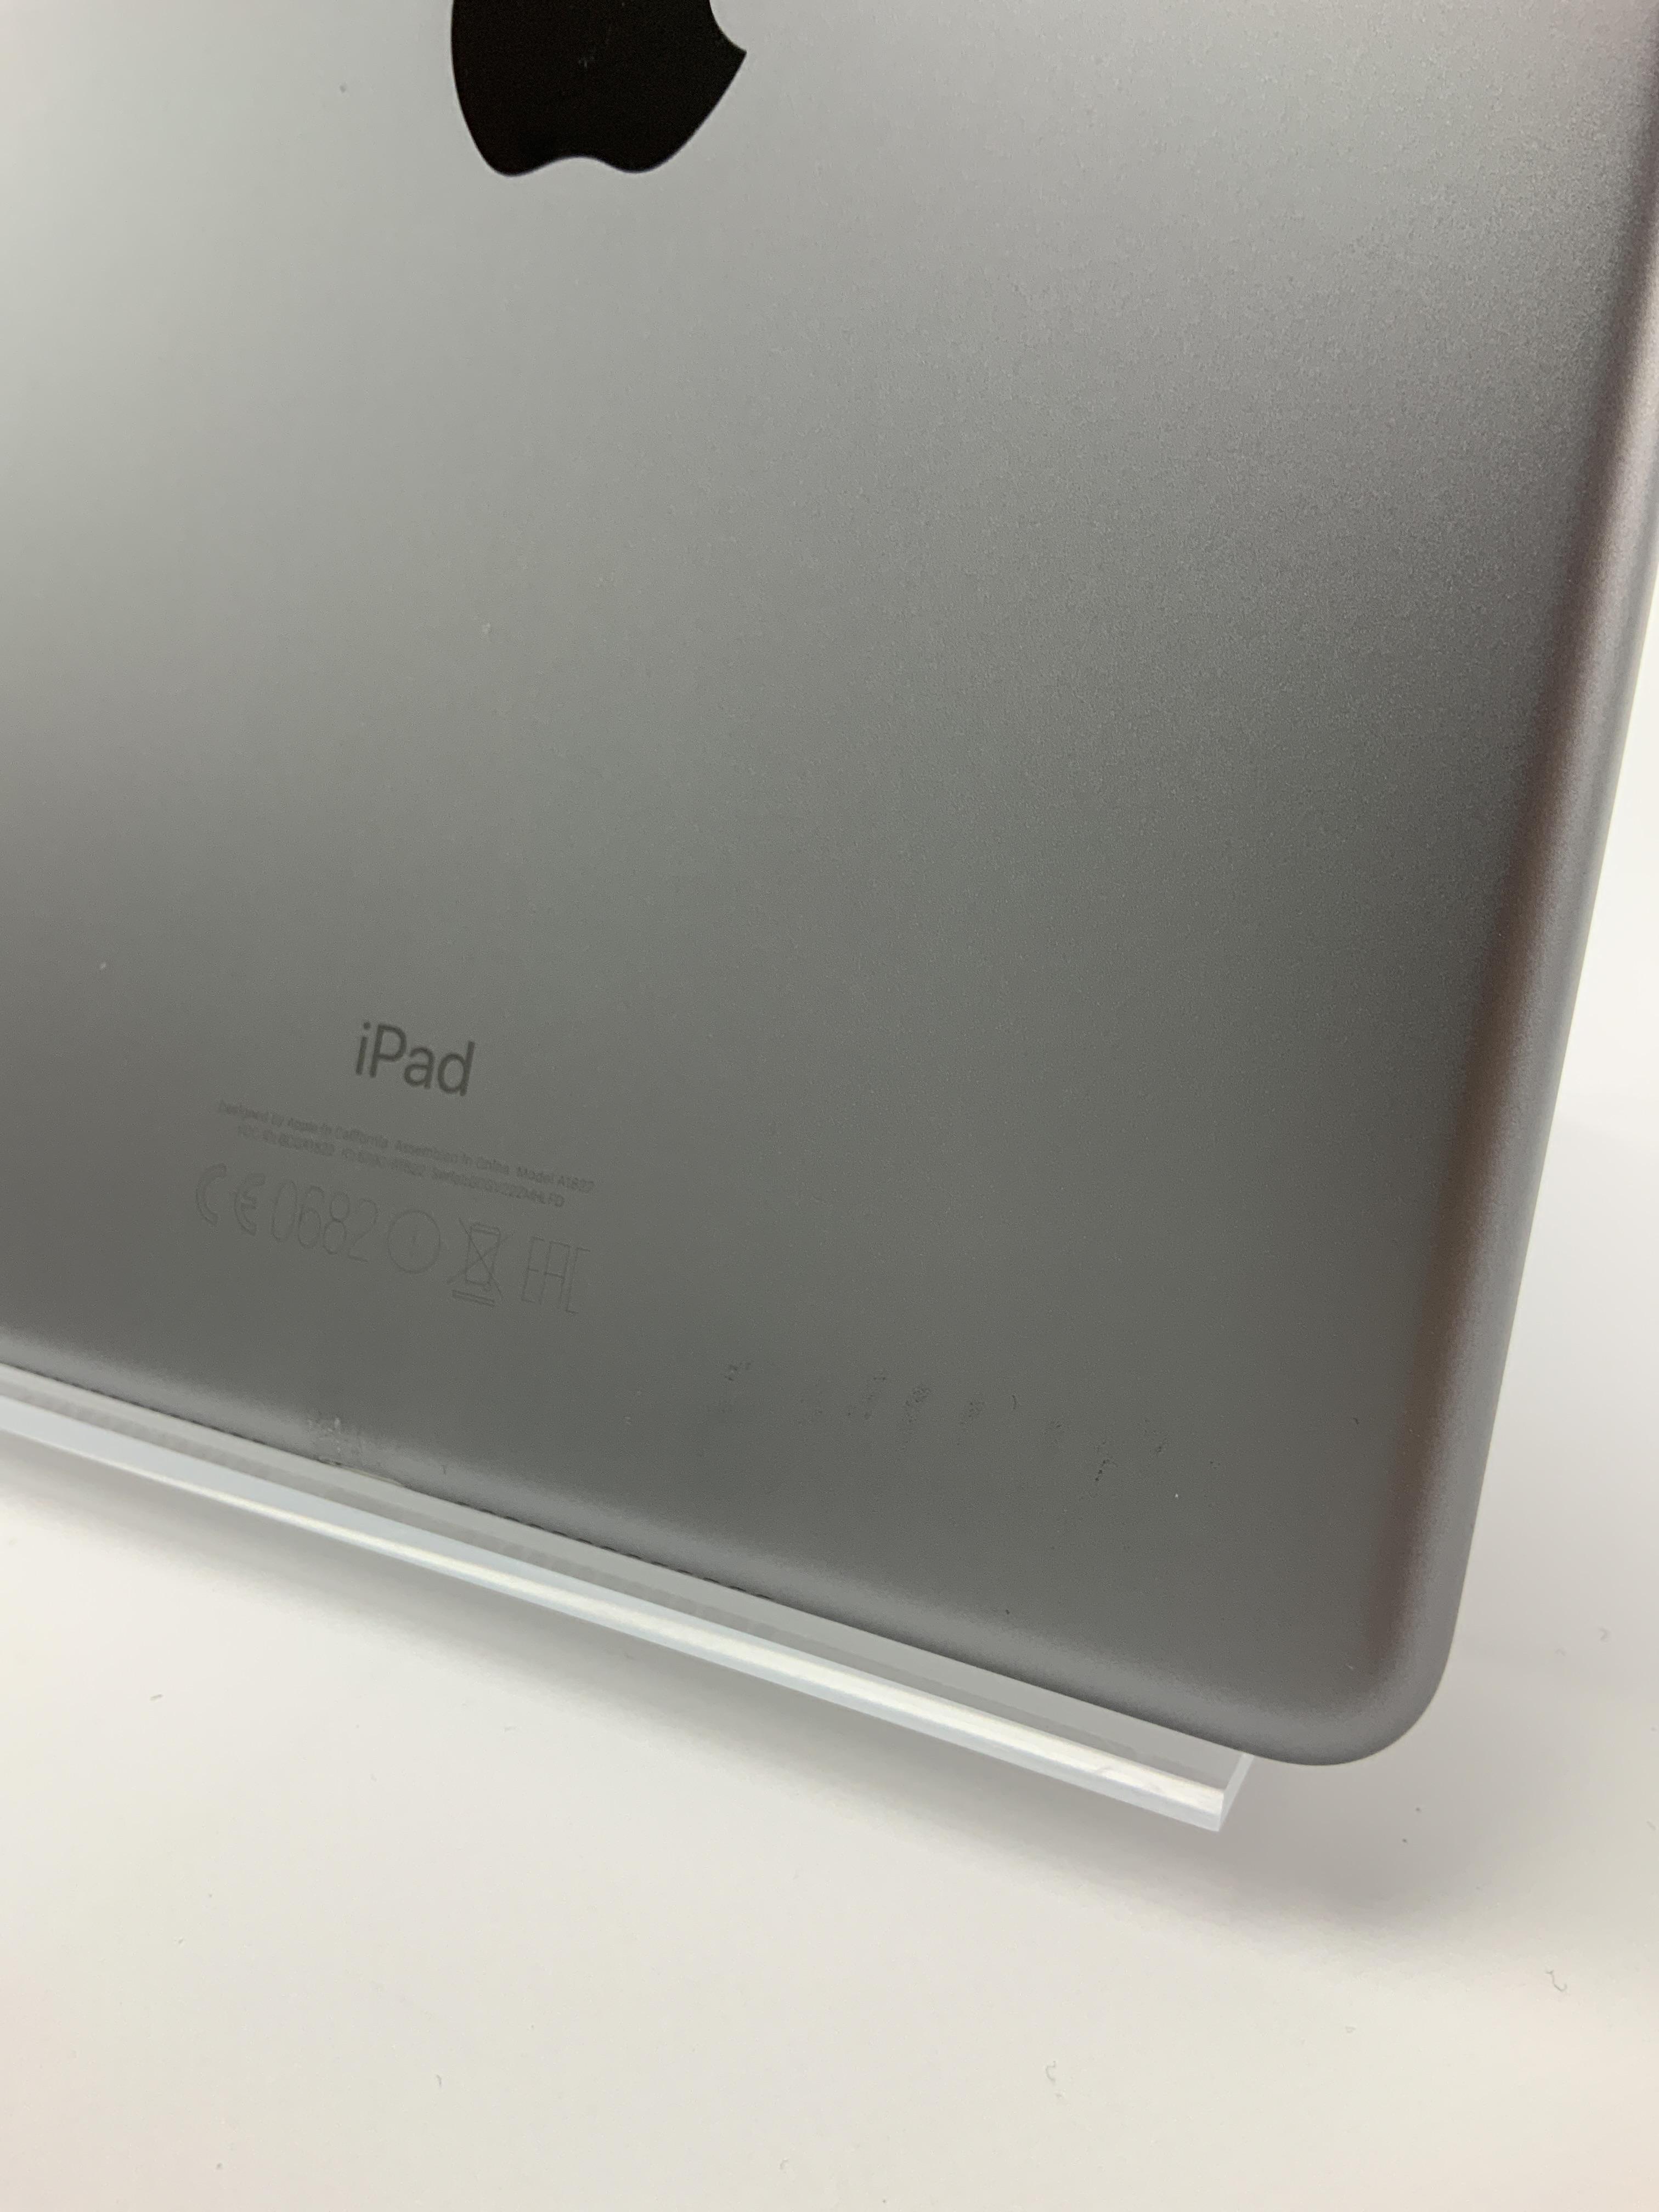 iPad 5 Wi-Fi 128GB, 128GB, Space Gray, Bild 4